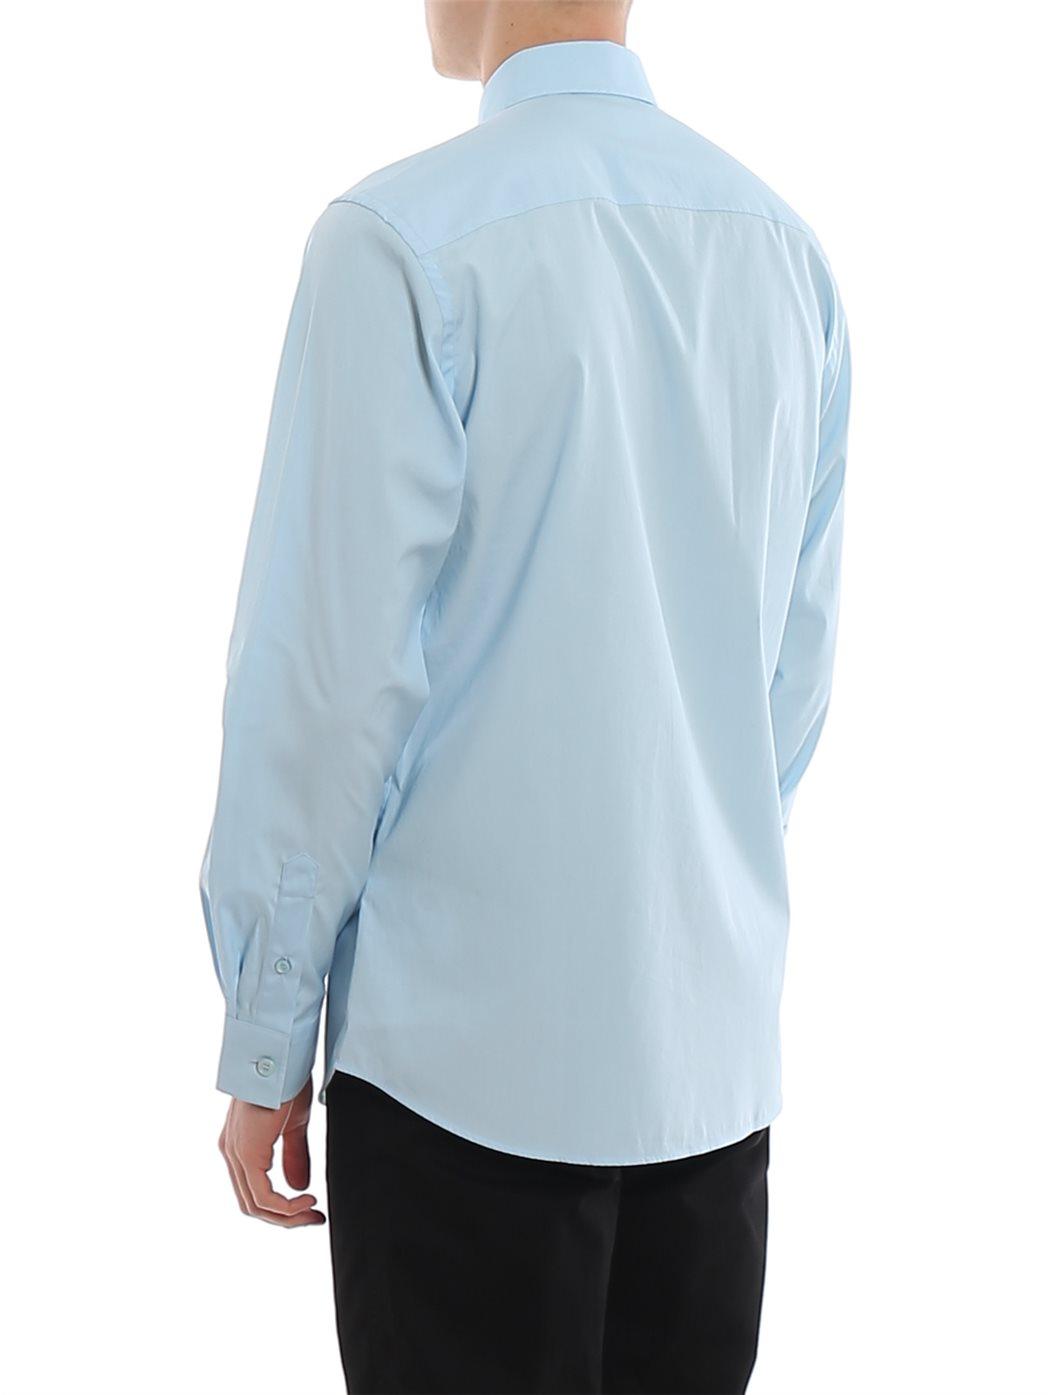 BURBERRY 8024524 Pale-blue CAMICIE